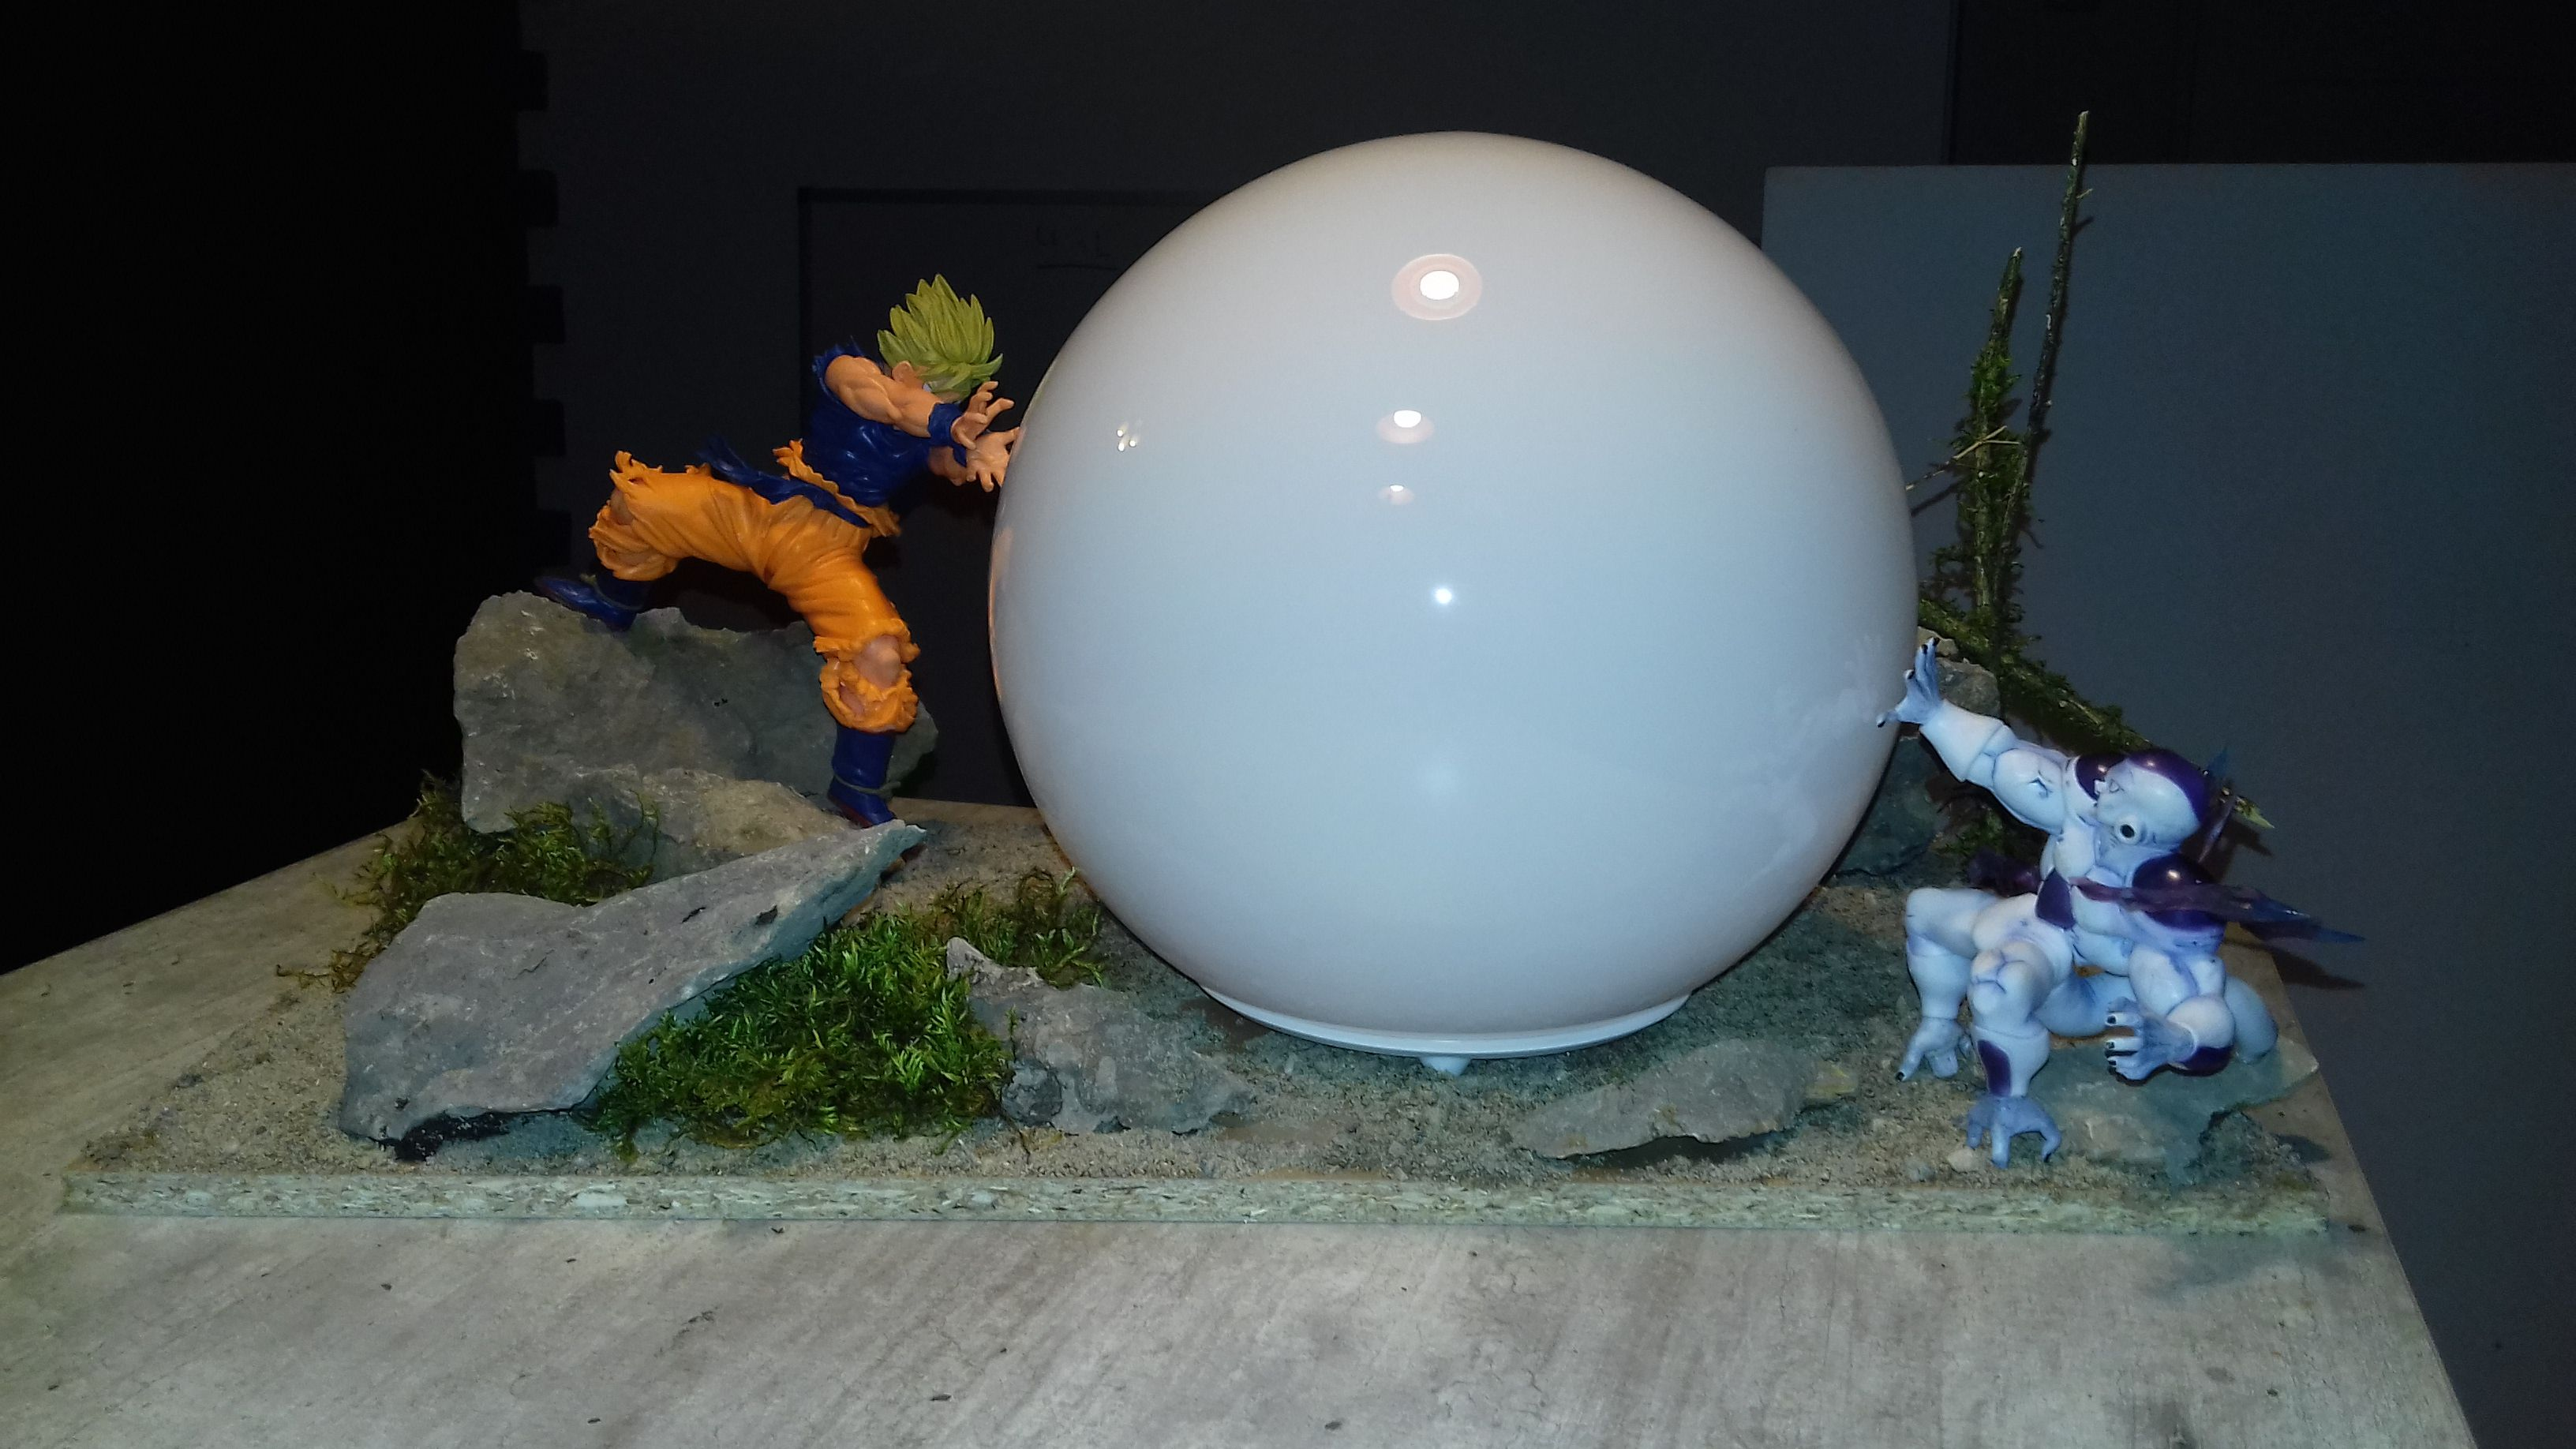 Lampe Dragon Ball Ball Lamps